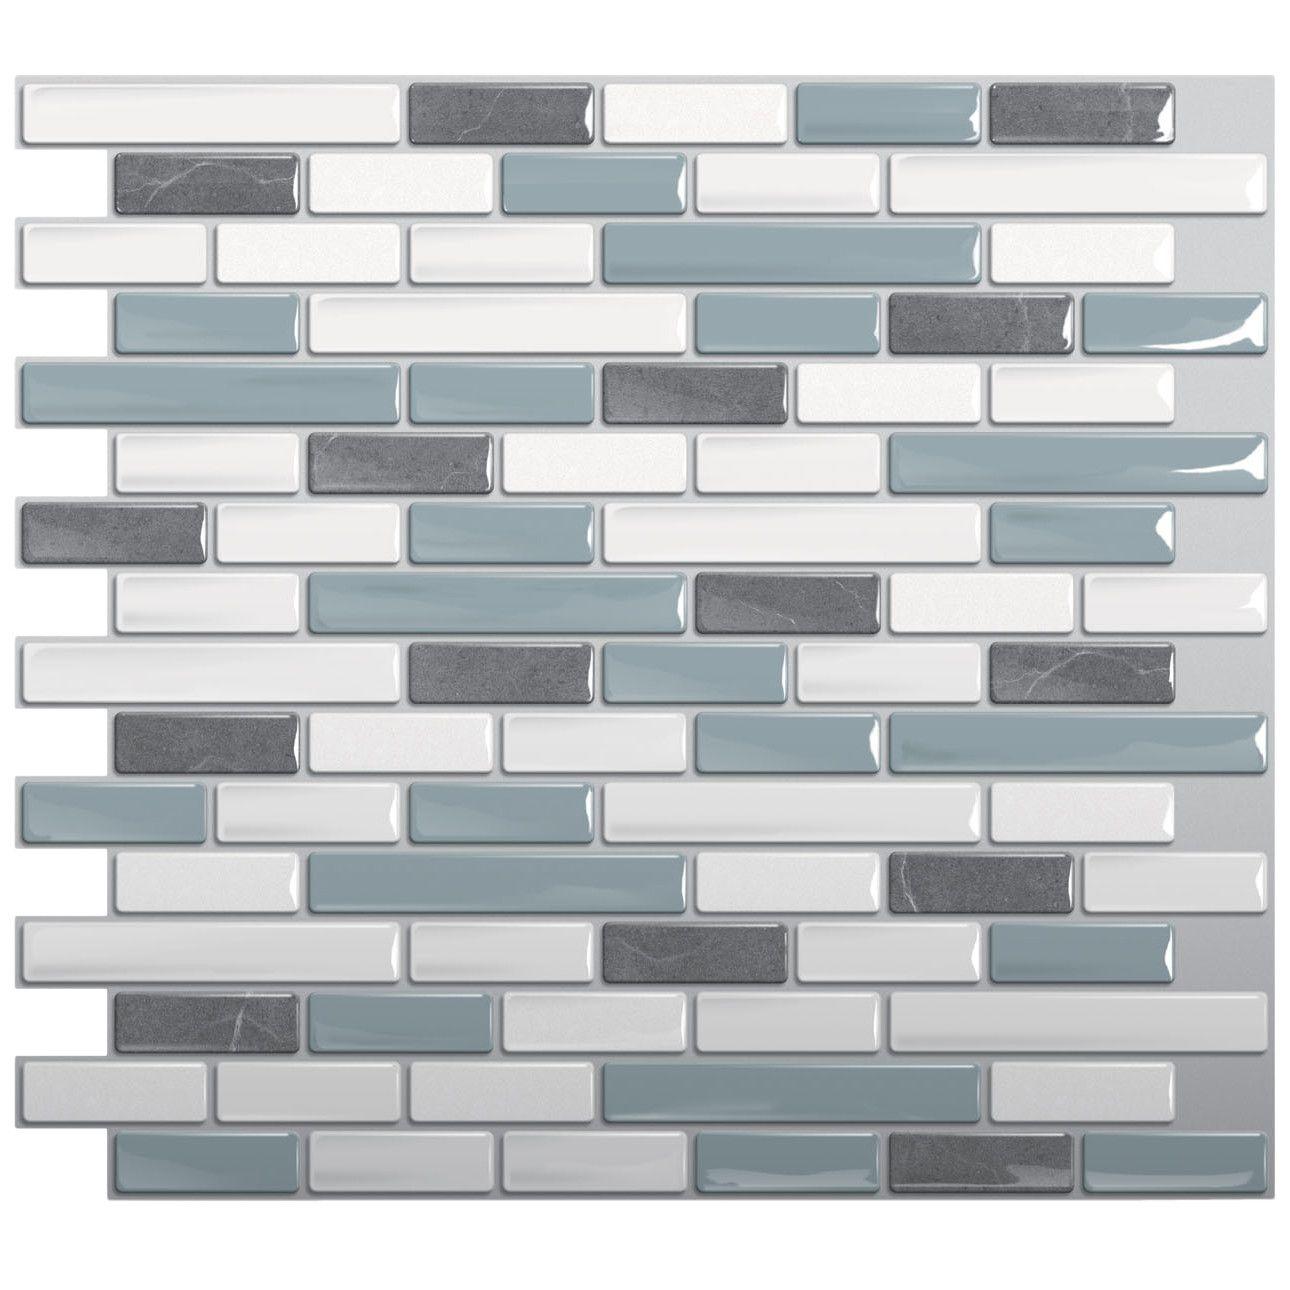 "Smart Tiles Mosaik 9.1"" x 10.2"" Mosaic Tile in Gray & Blue"